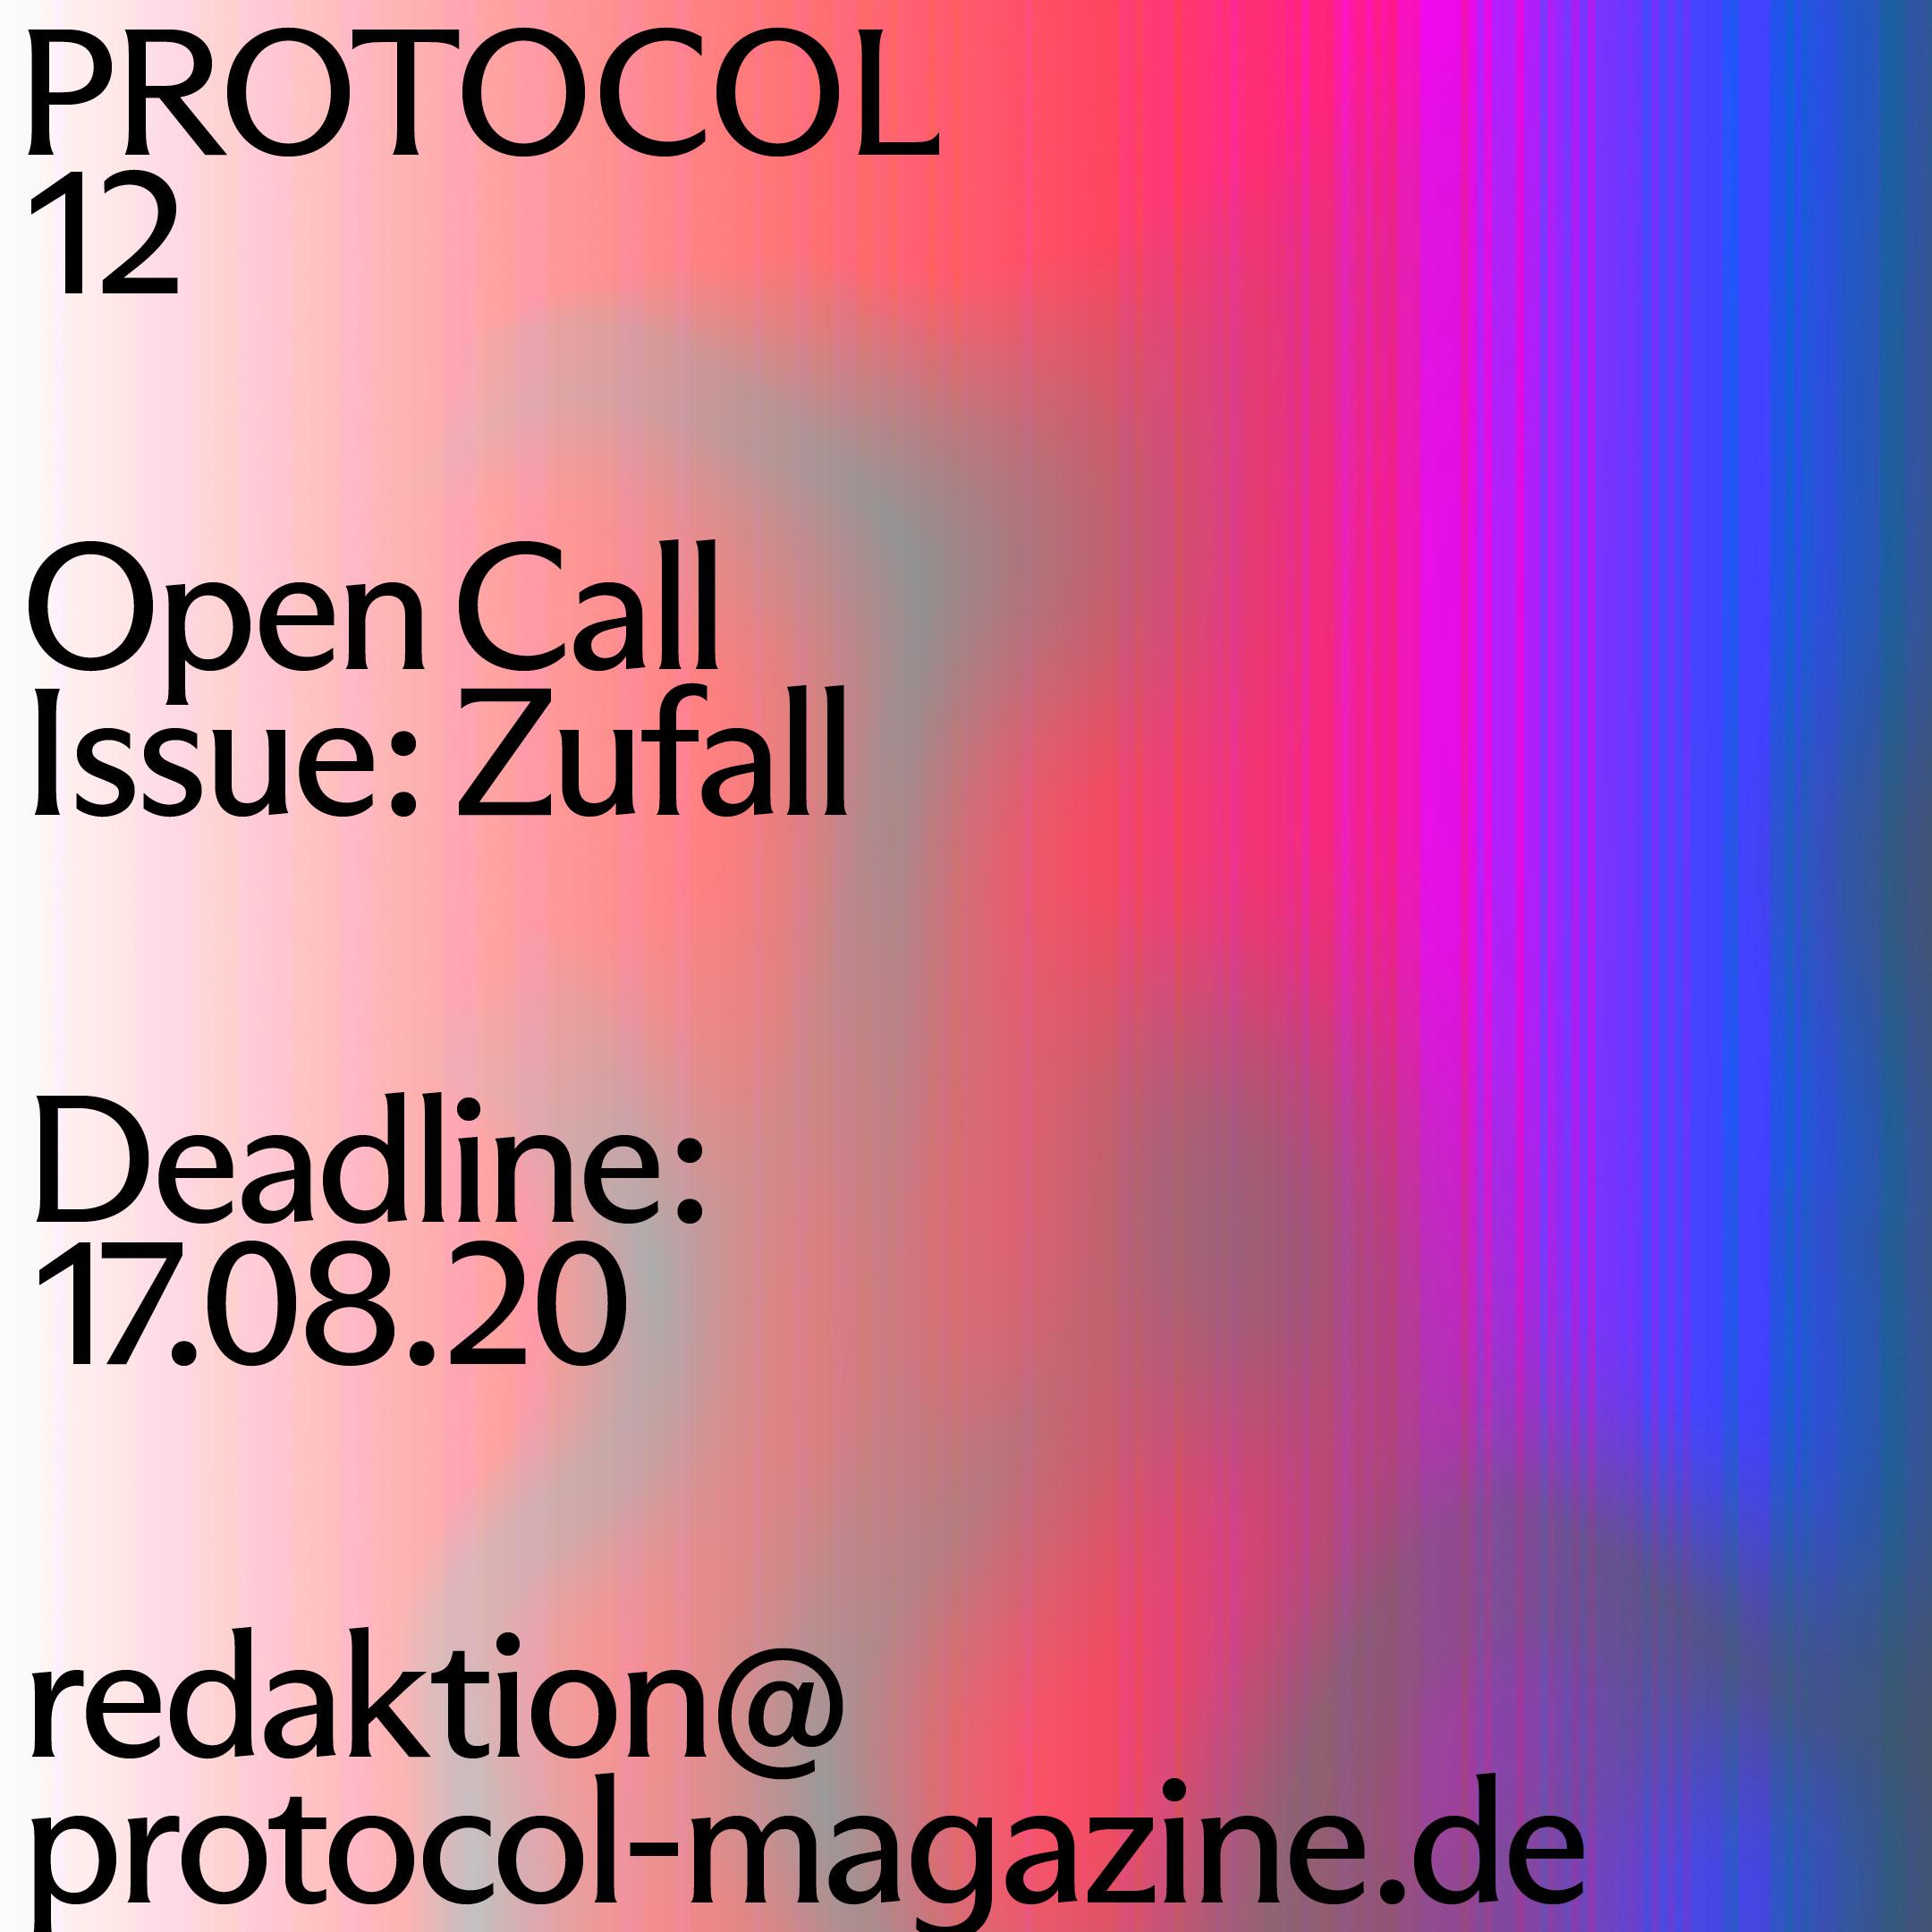 p12_Instagram-Redaktion_Protocol-Magazin_Magazin-fuer-Architektur-im-Kontext20